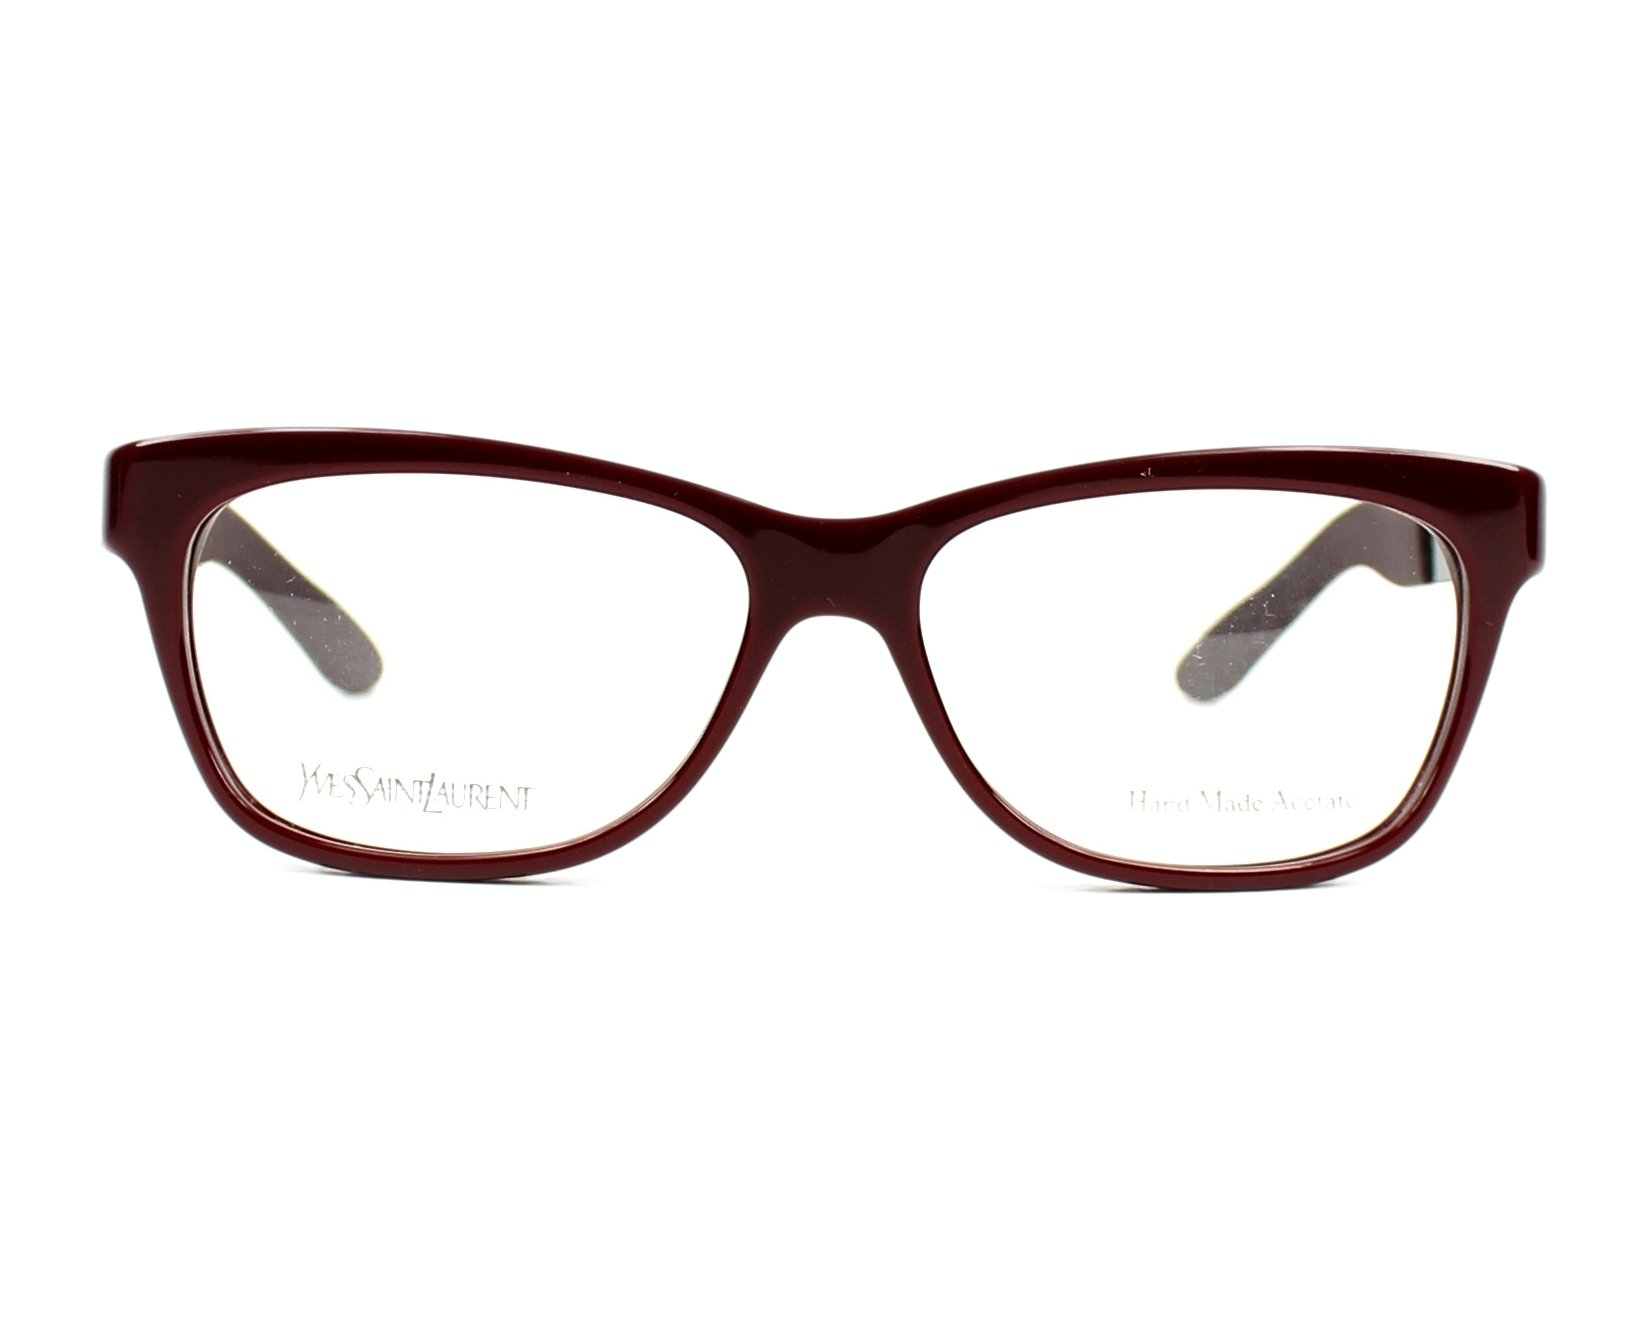 Yves saint laurent eyeglasses ysl 6367 pl5 bordeaux visionet for Miroir yves saint laurent